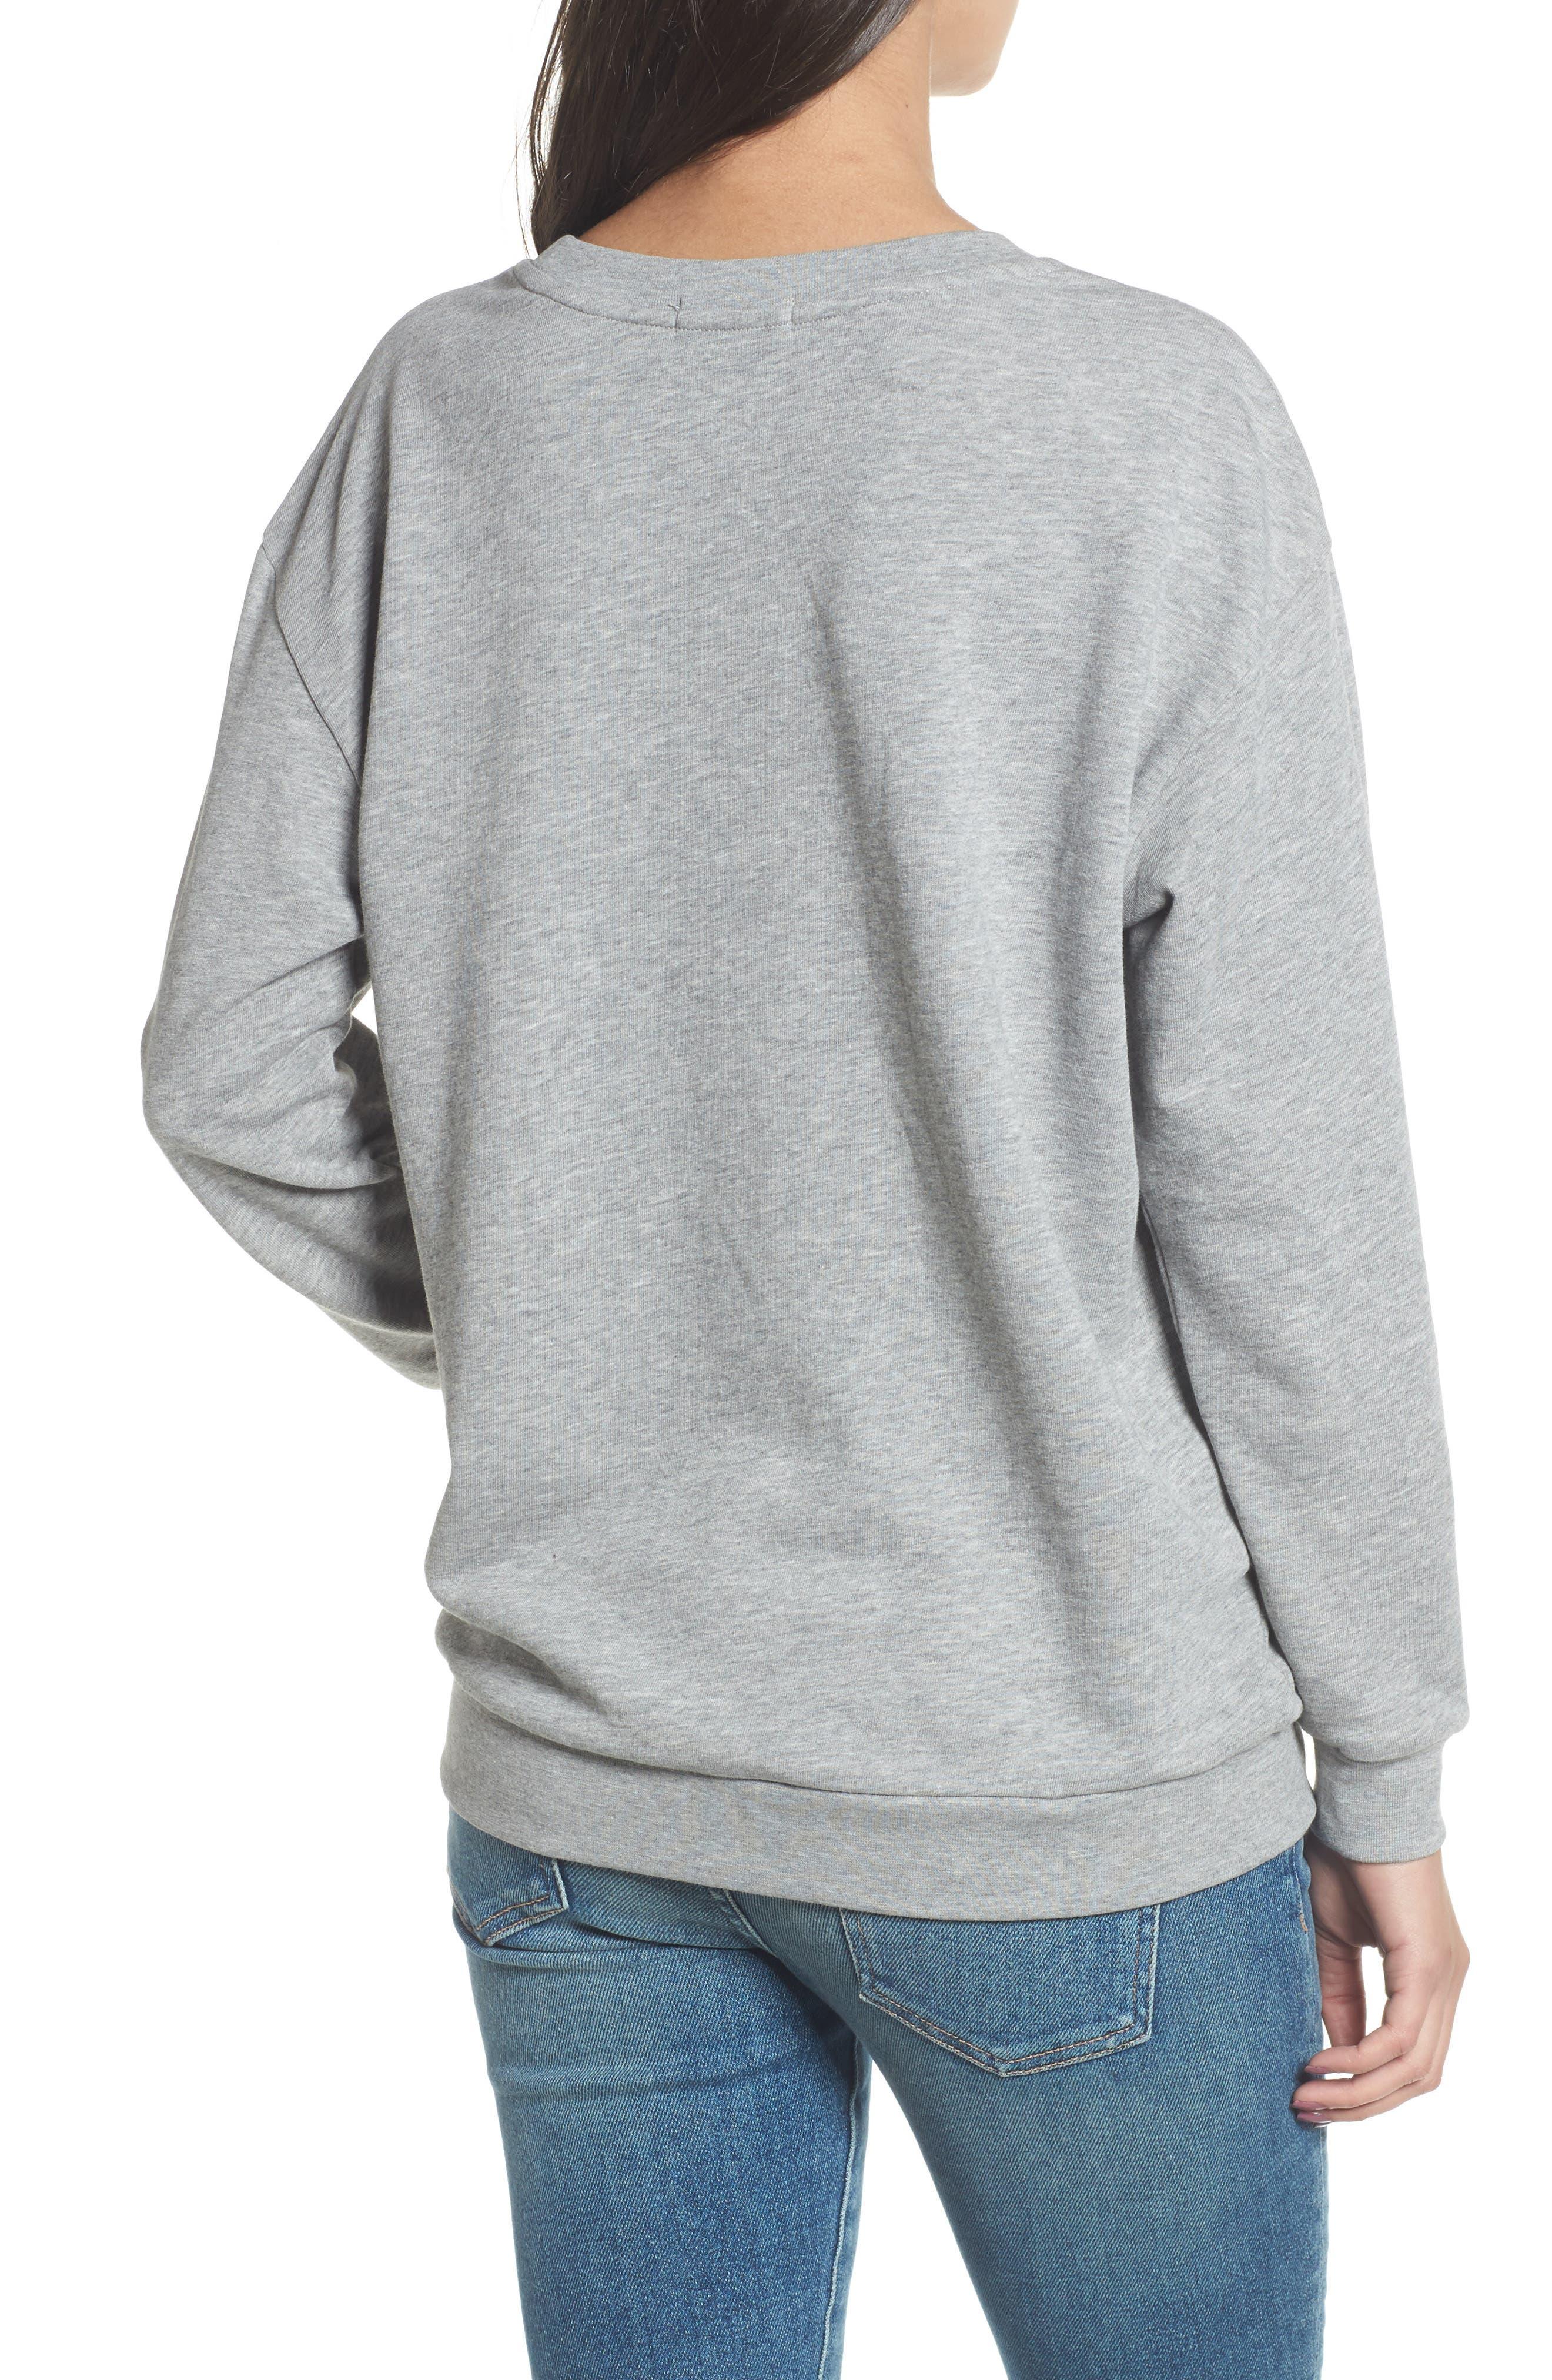 Alexa - Super Stars Sweatshirt,                             Alternate thumbnail 2, color,                             GREY